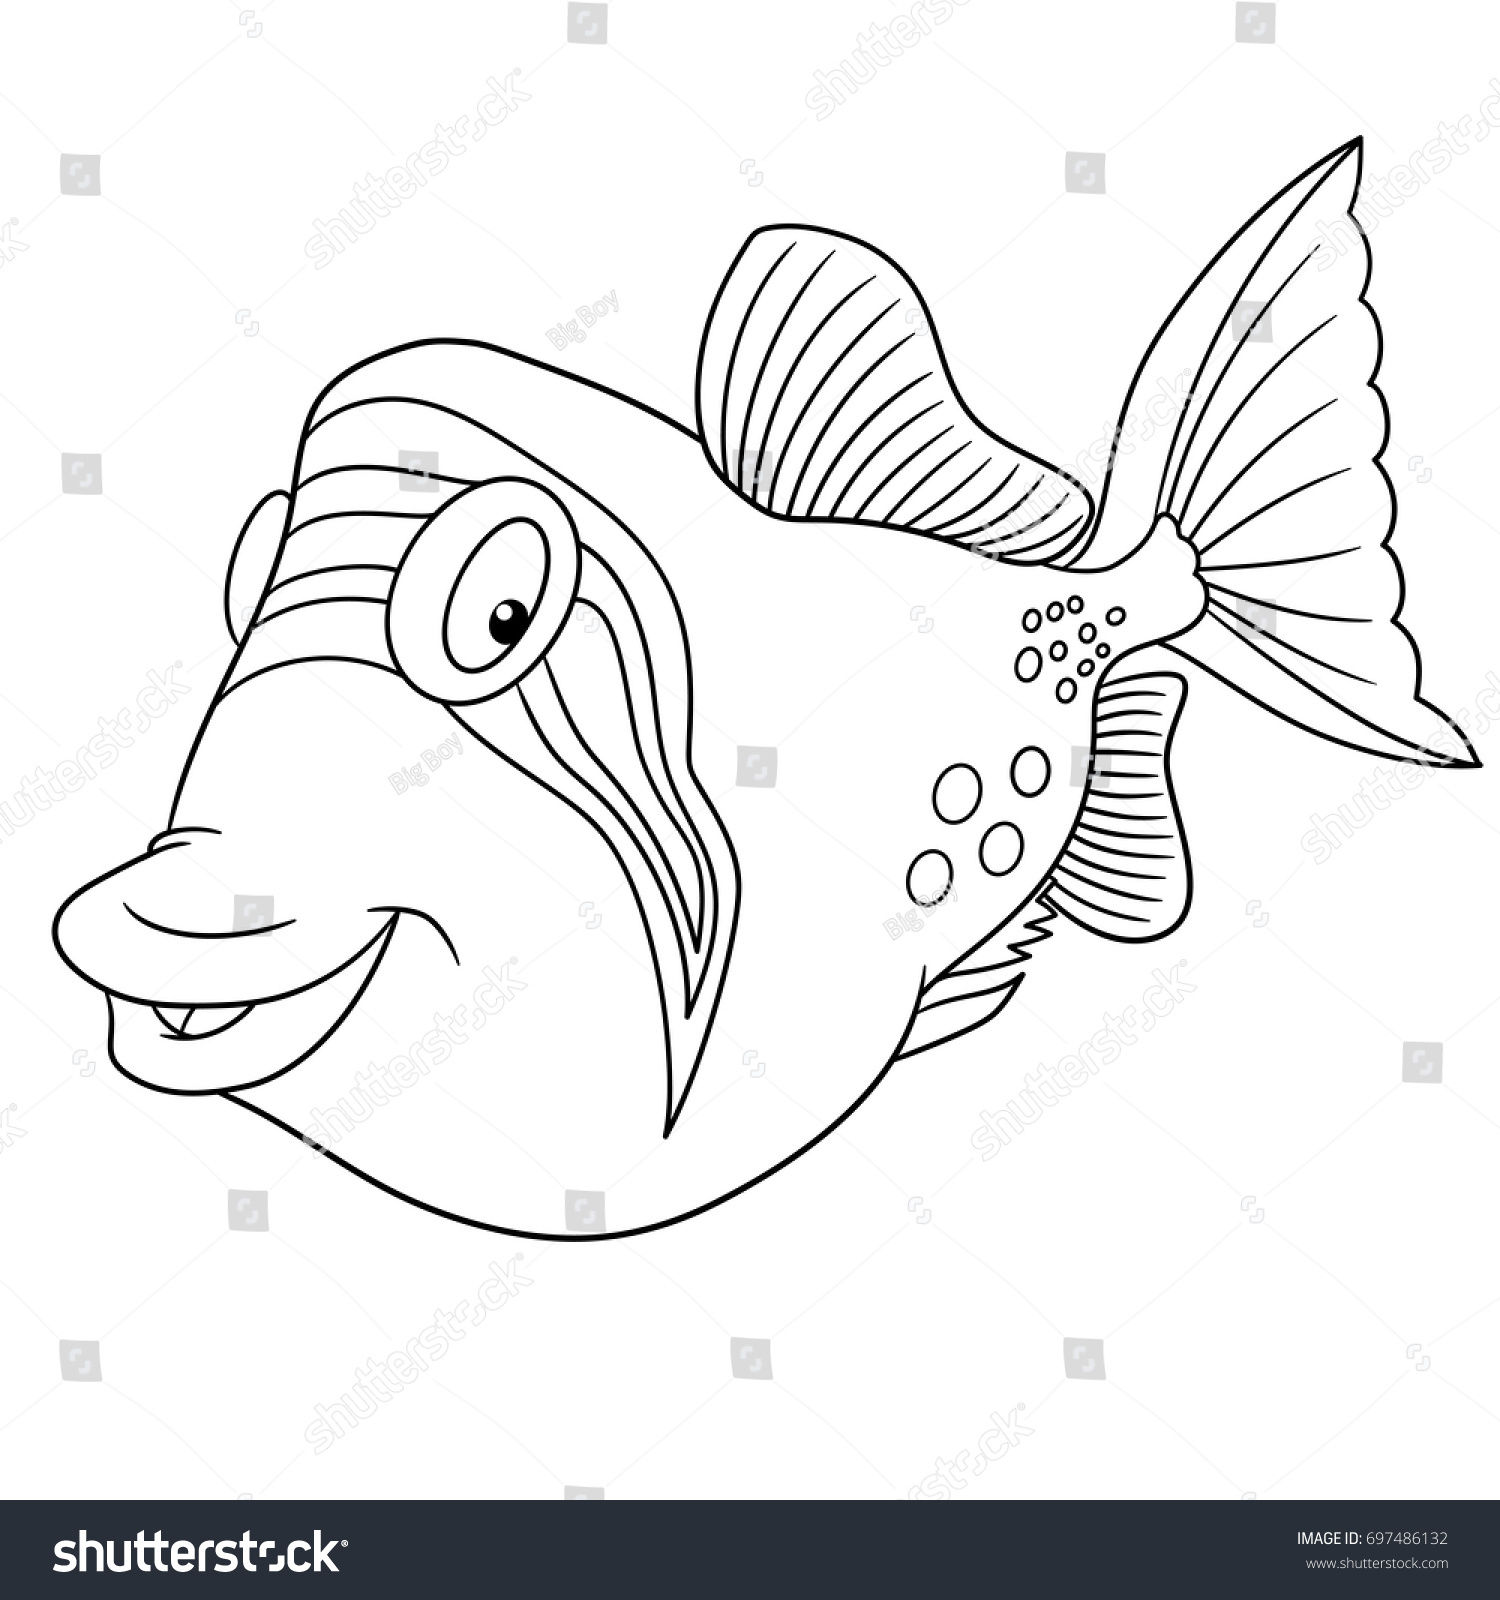 Coloring Page Cartoon Triggerfish Trigger Fish Stock Vector (Royalty ...